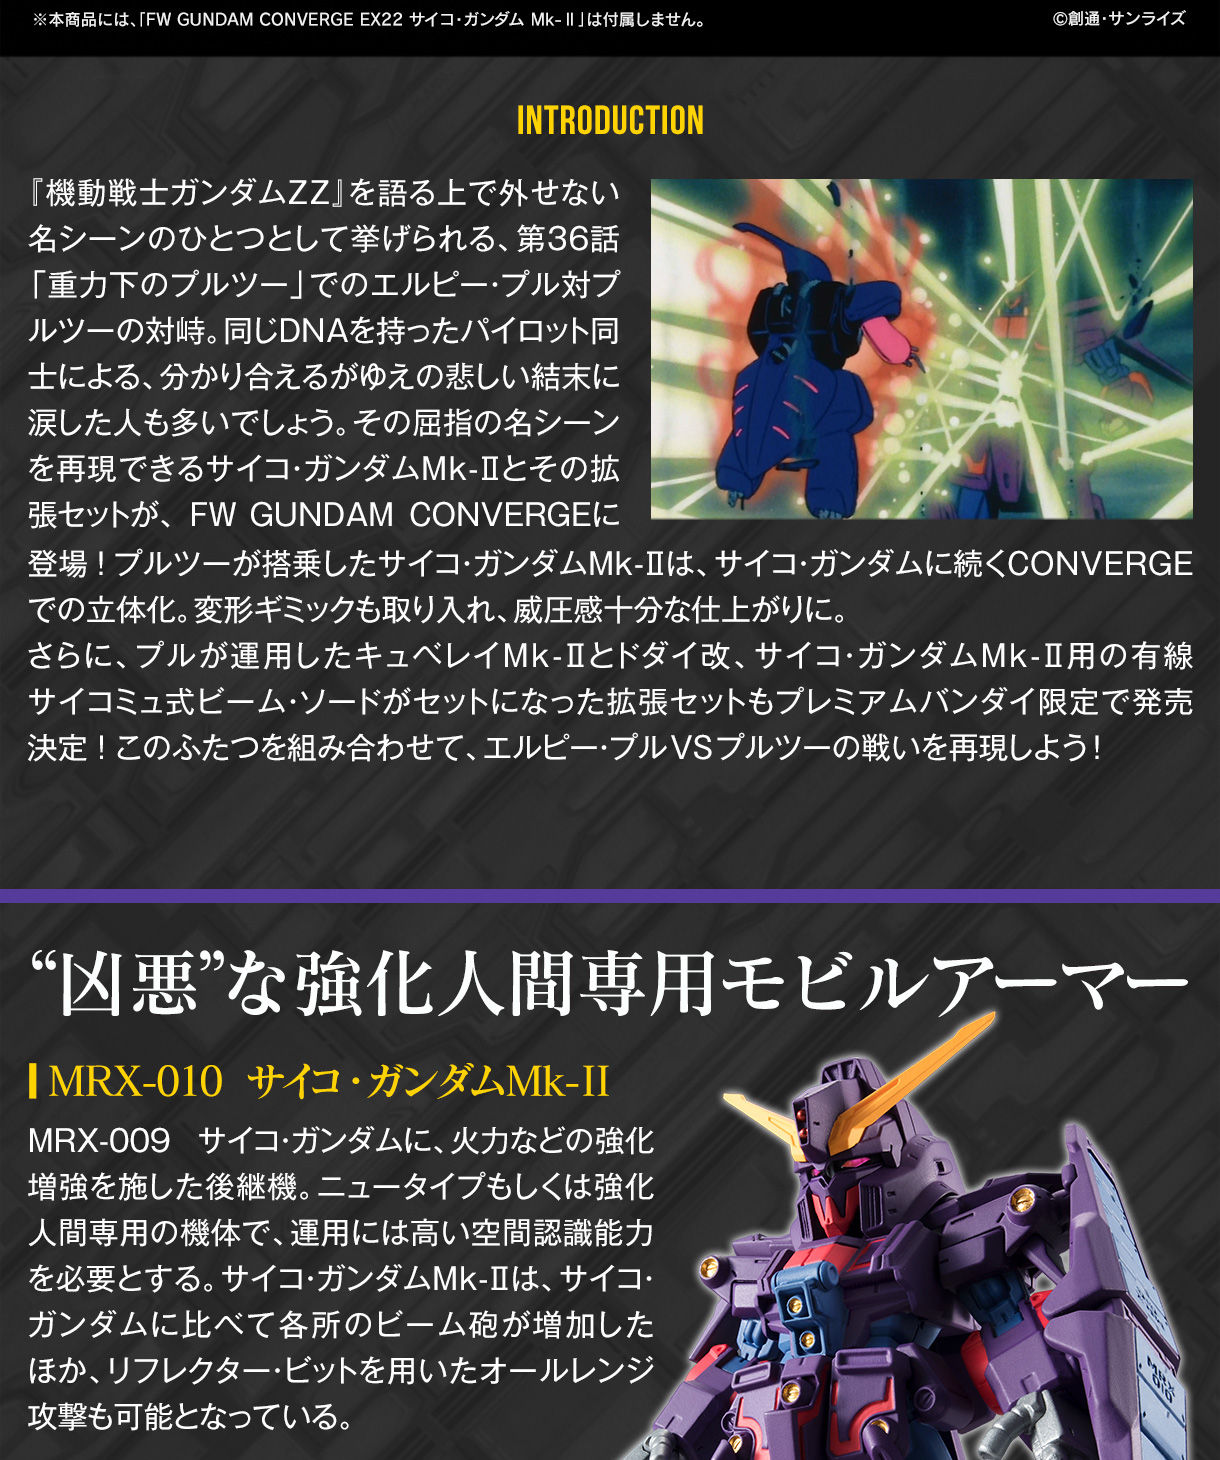 FW GUNDAM CONVERGE:CORE サイコ・ガンダムMk-II オプションパーツセット【プレミアムバンダイ限定】